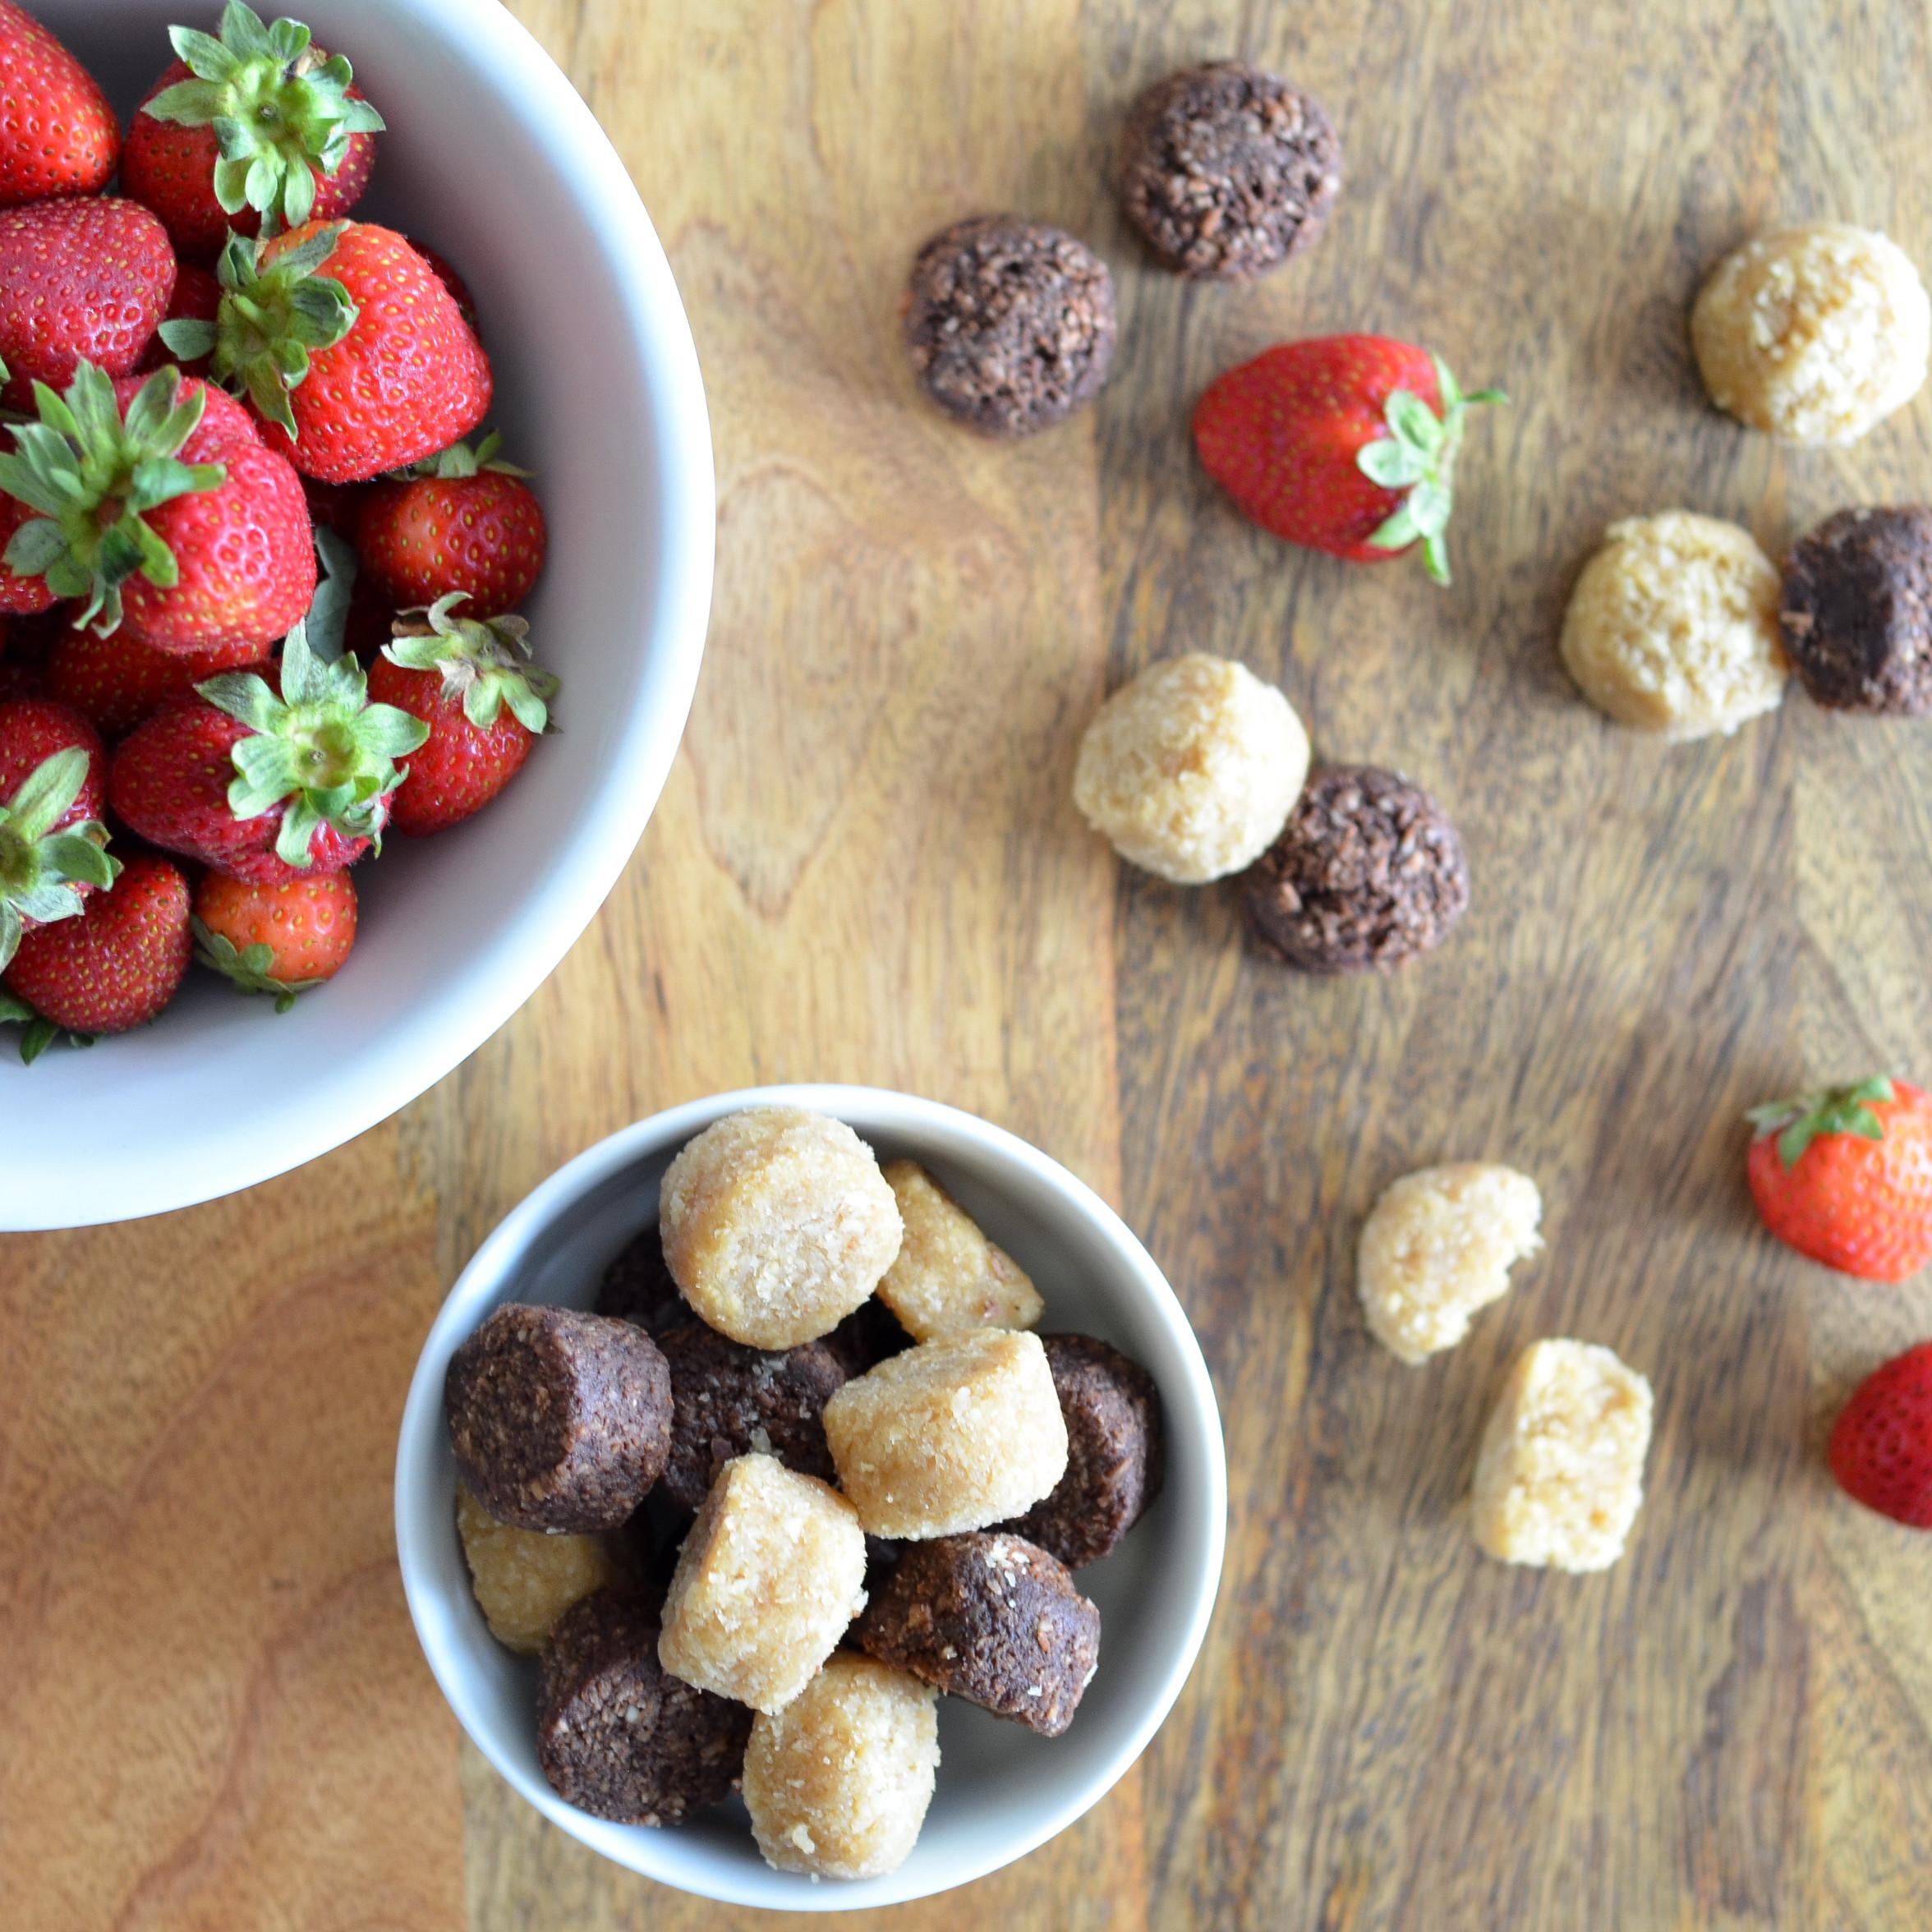 Healthy Sweet Desserts  Five Easy No Bake Healthy Dessert Ideas The